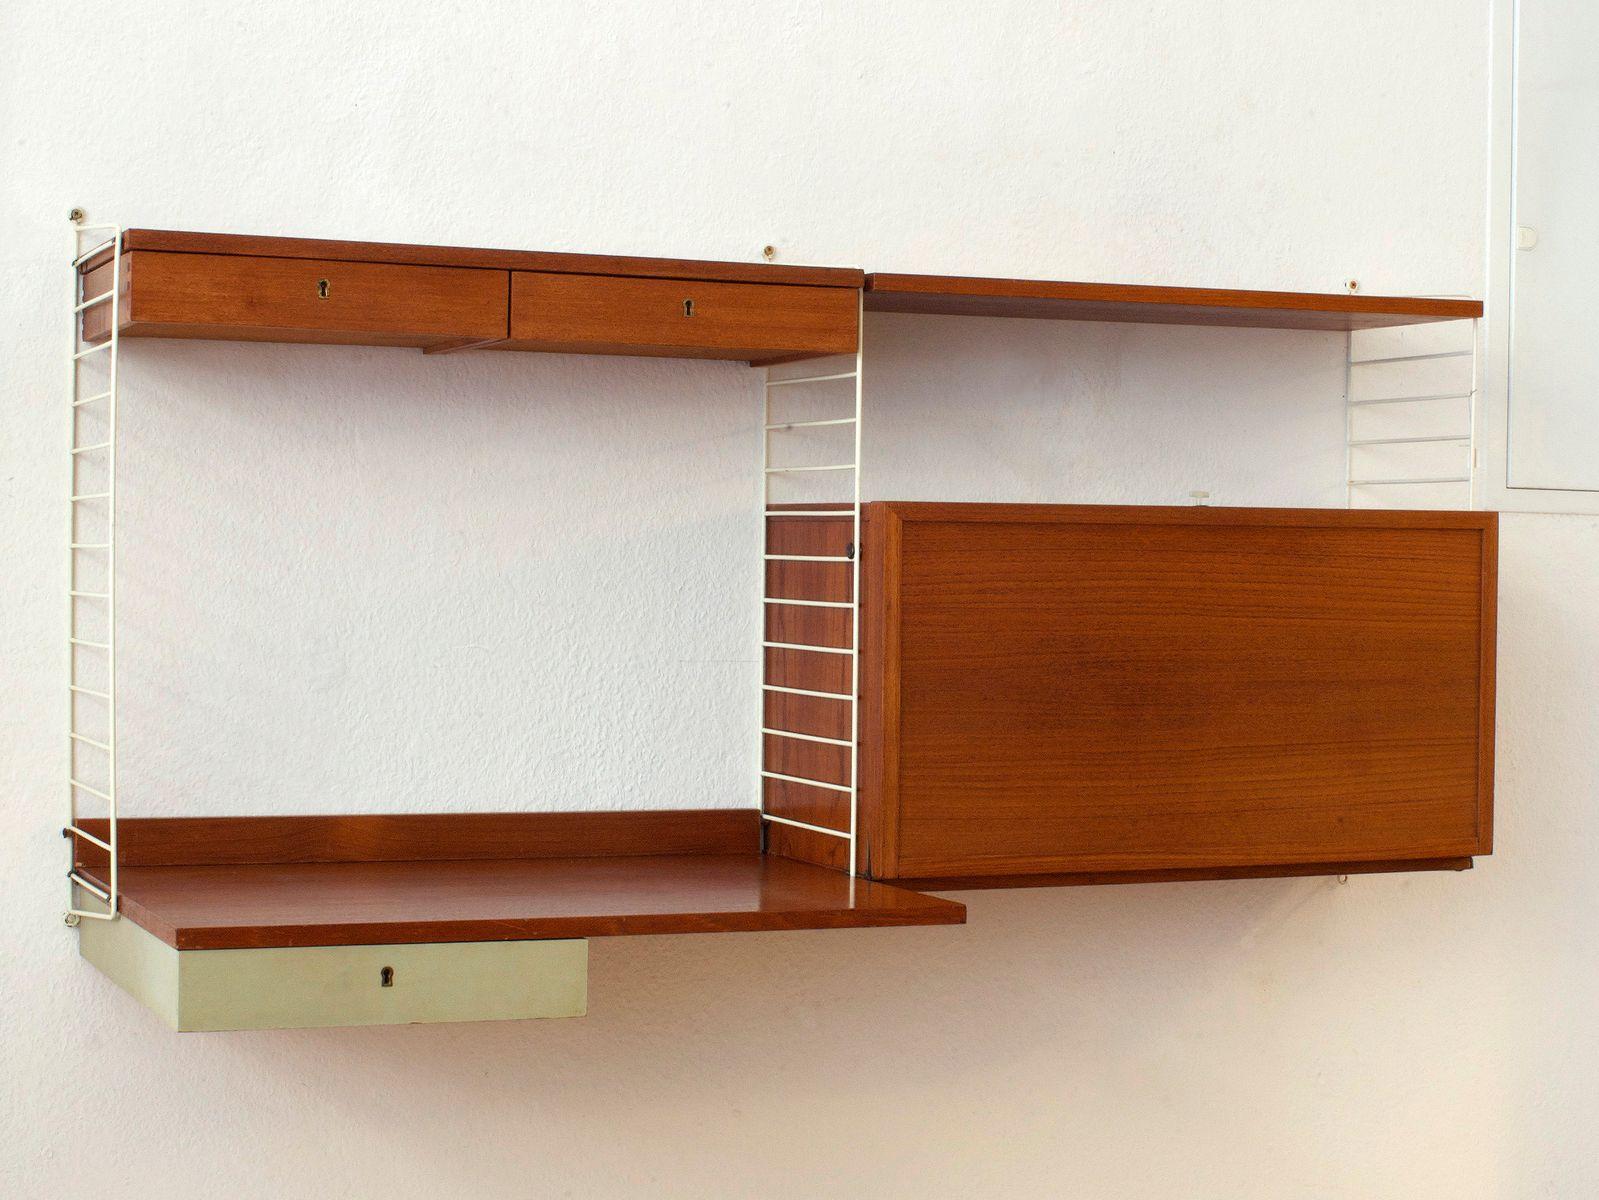 Nisse Strinning wall unit by kajsa nils nisse strinning for string 1950s for